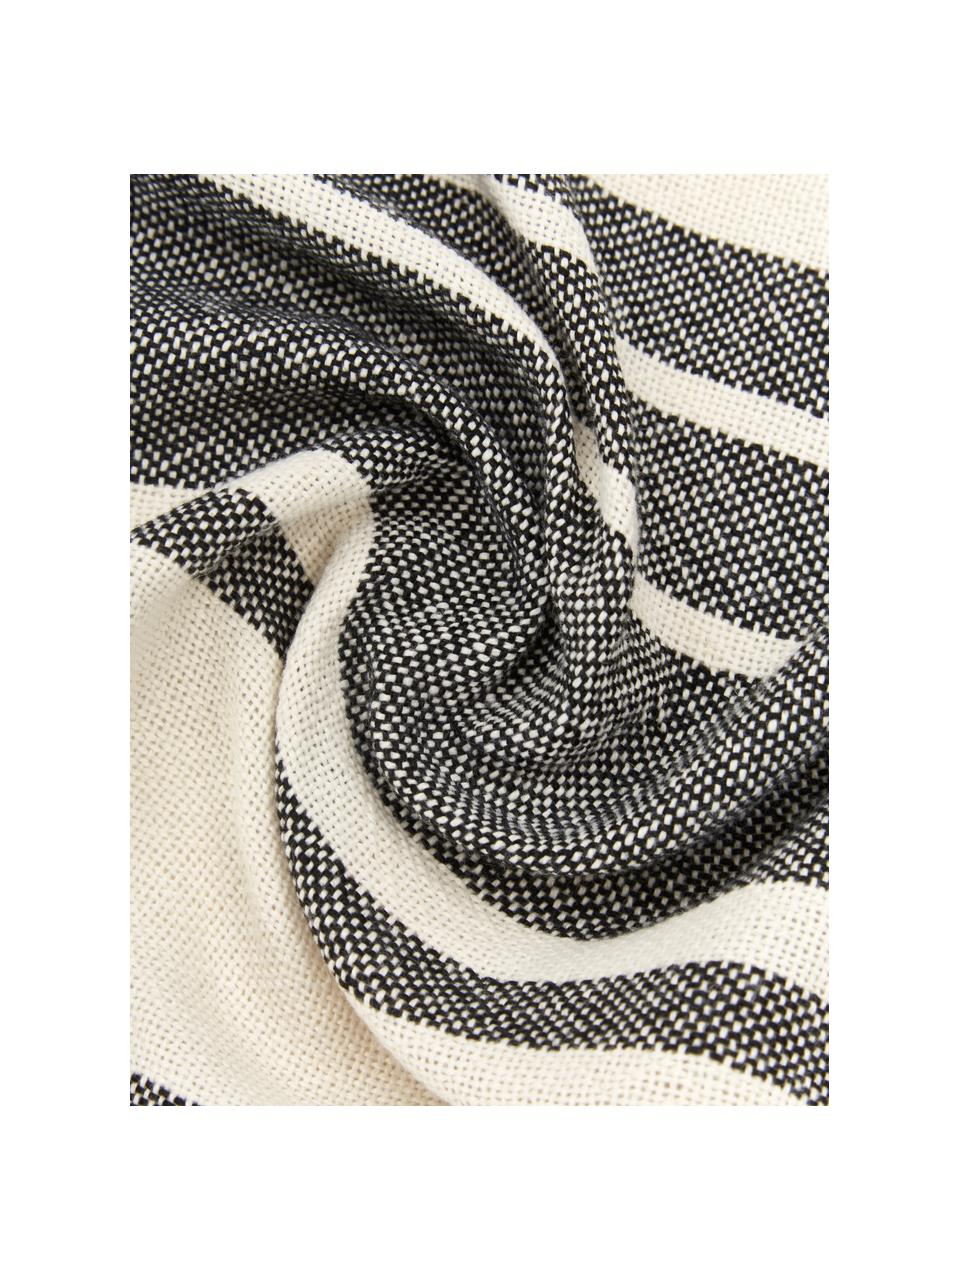 Gestreiftes Plaid Lines aus recyceltem Polyester, 100% Recycelter Polyester, Schwarz, Weiß, 130 x 170 cm